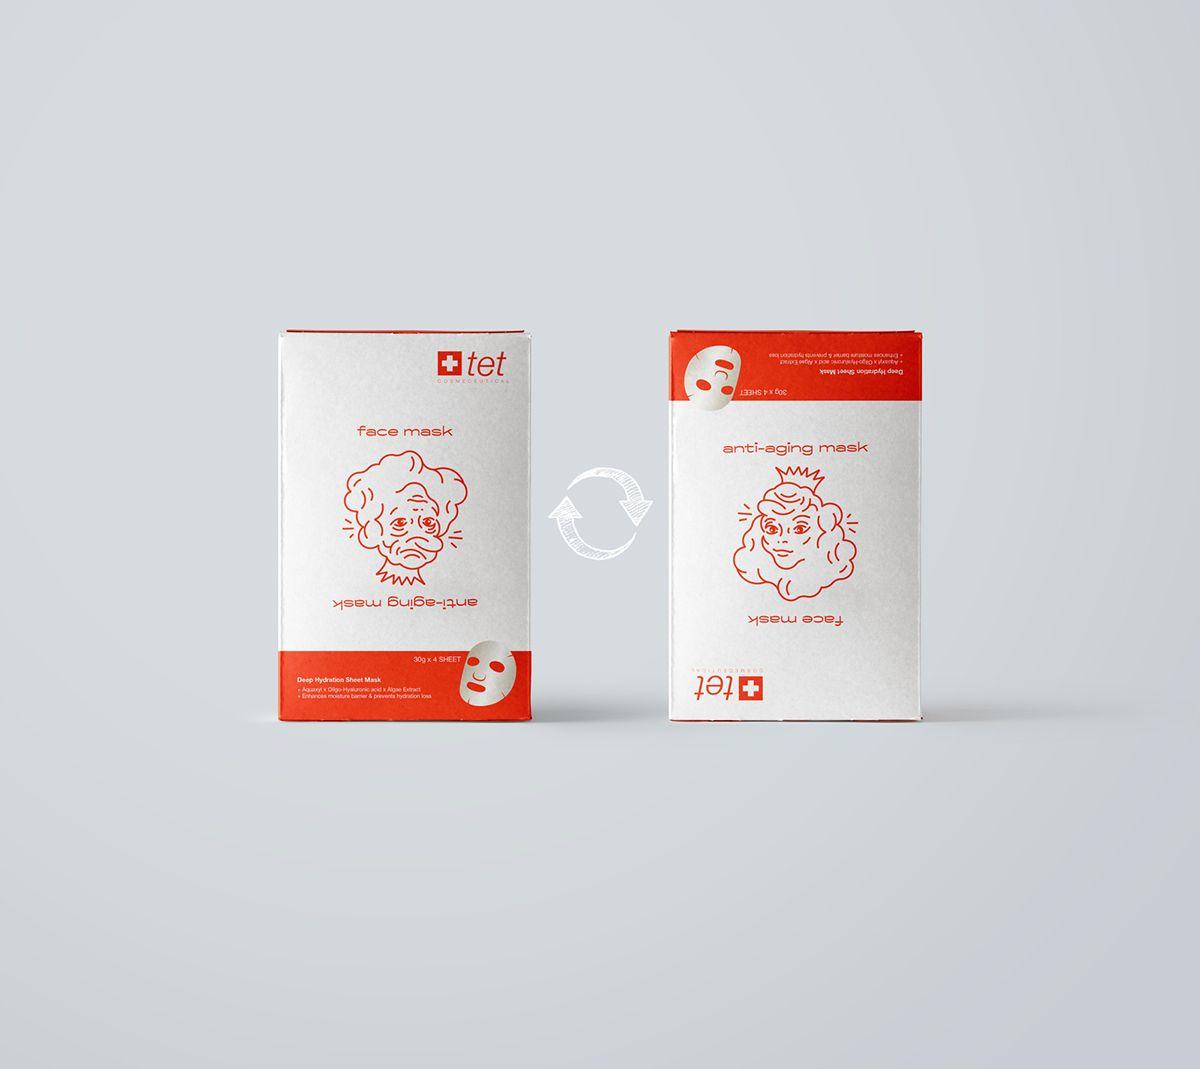 Antiaging face masks face mask anti aging anti aging